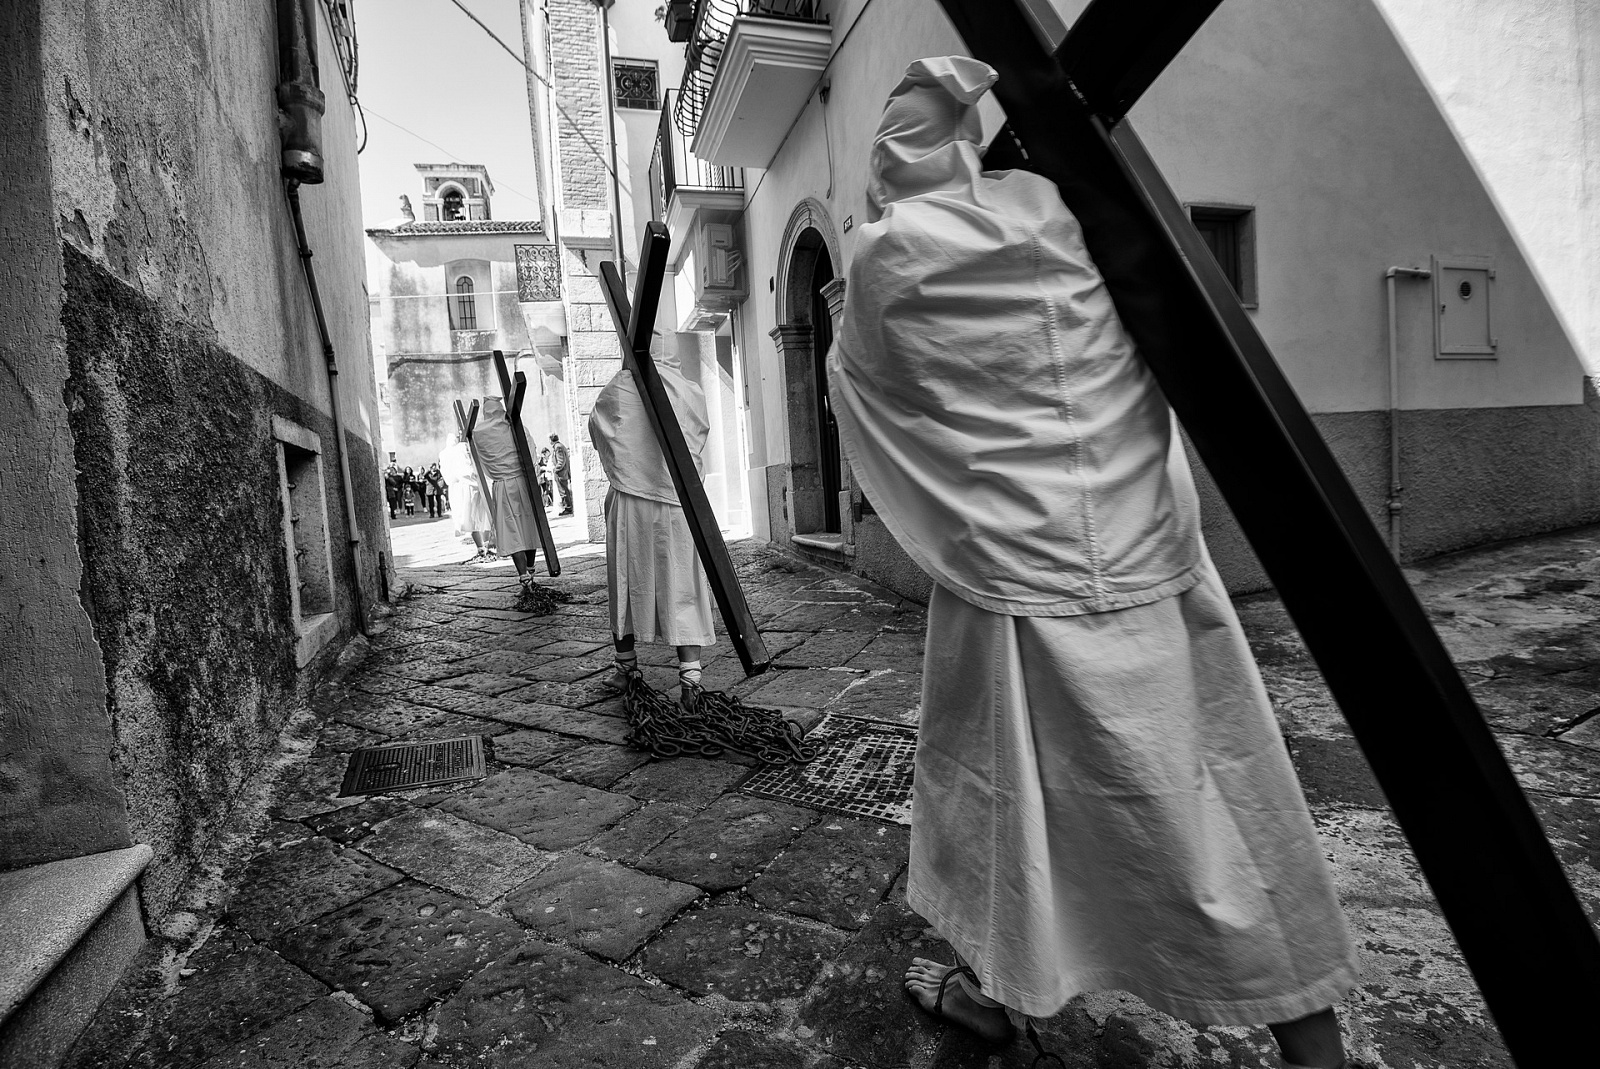 Mea Culpa - Italy